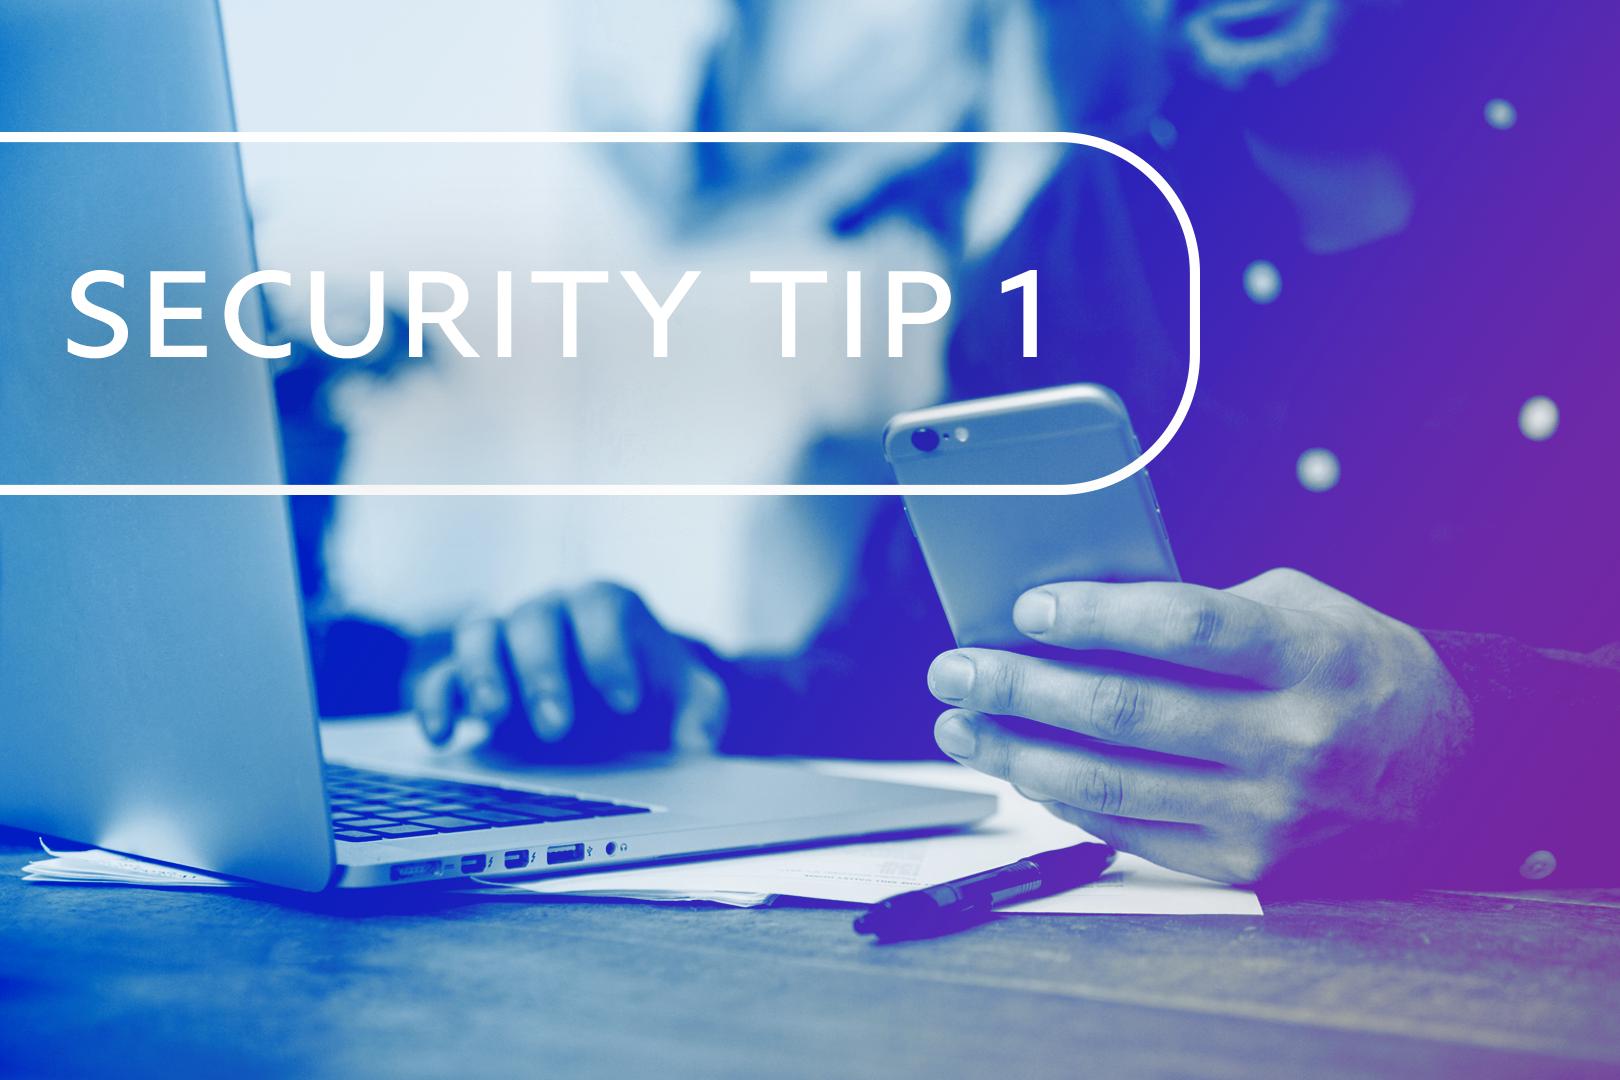 Security Tip 1